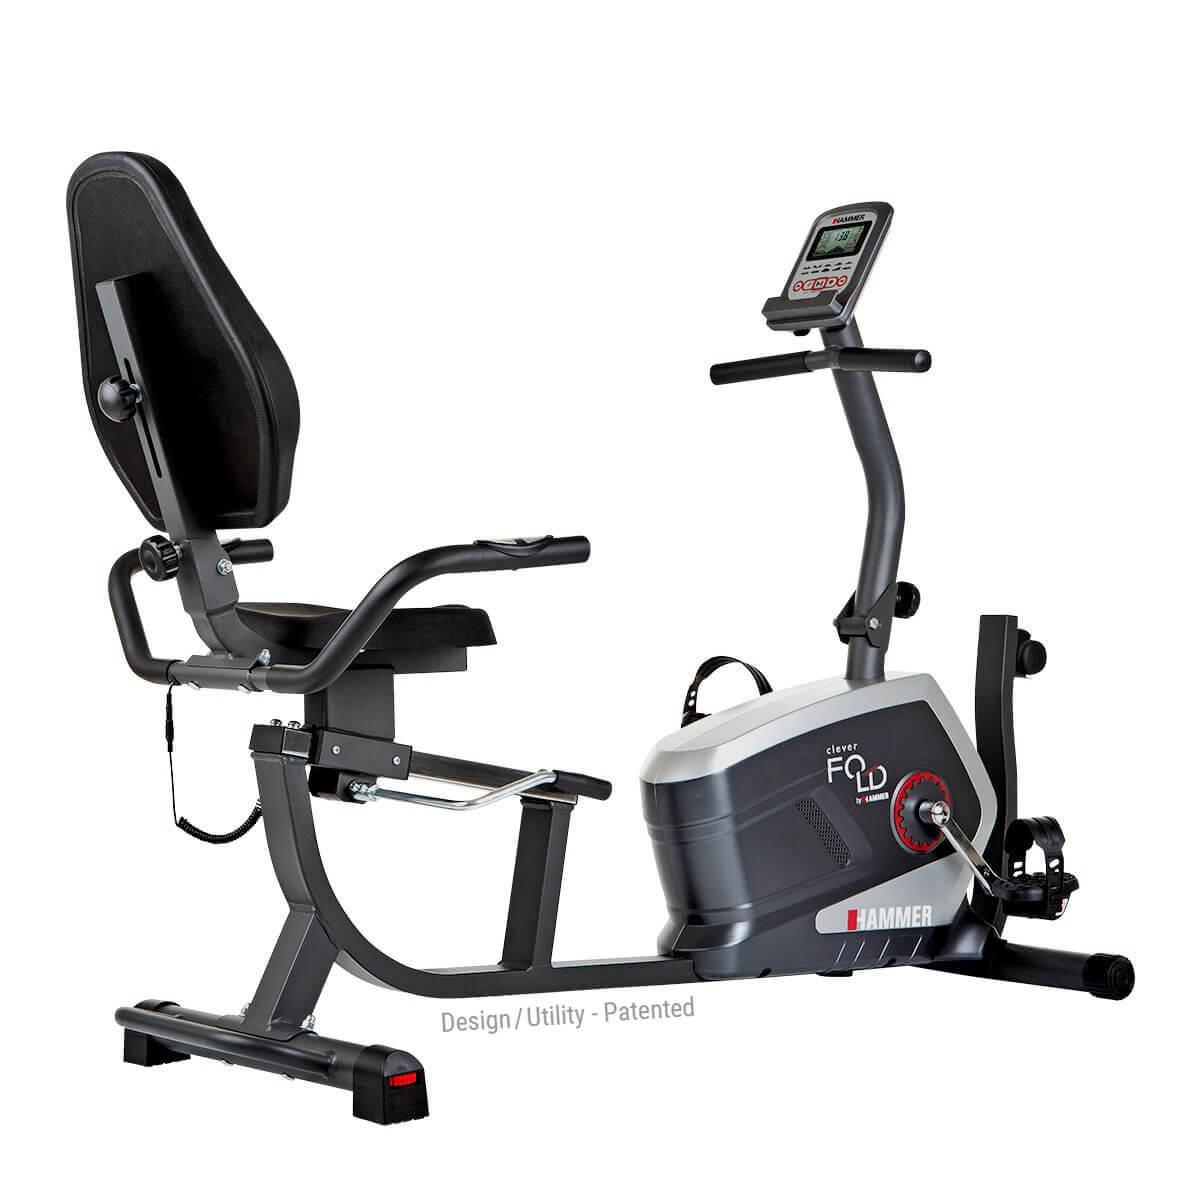 Sittande motionscykel Cleverfold RC5 DEMO